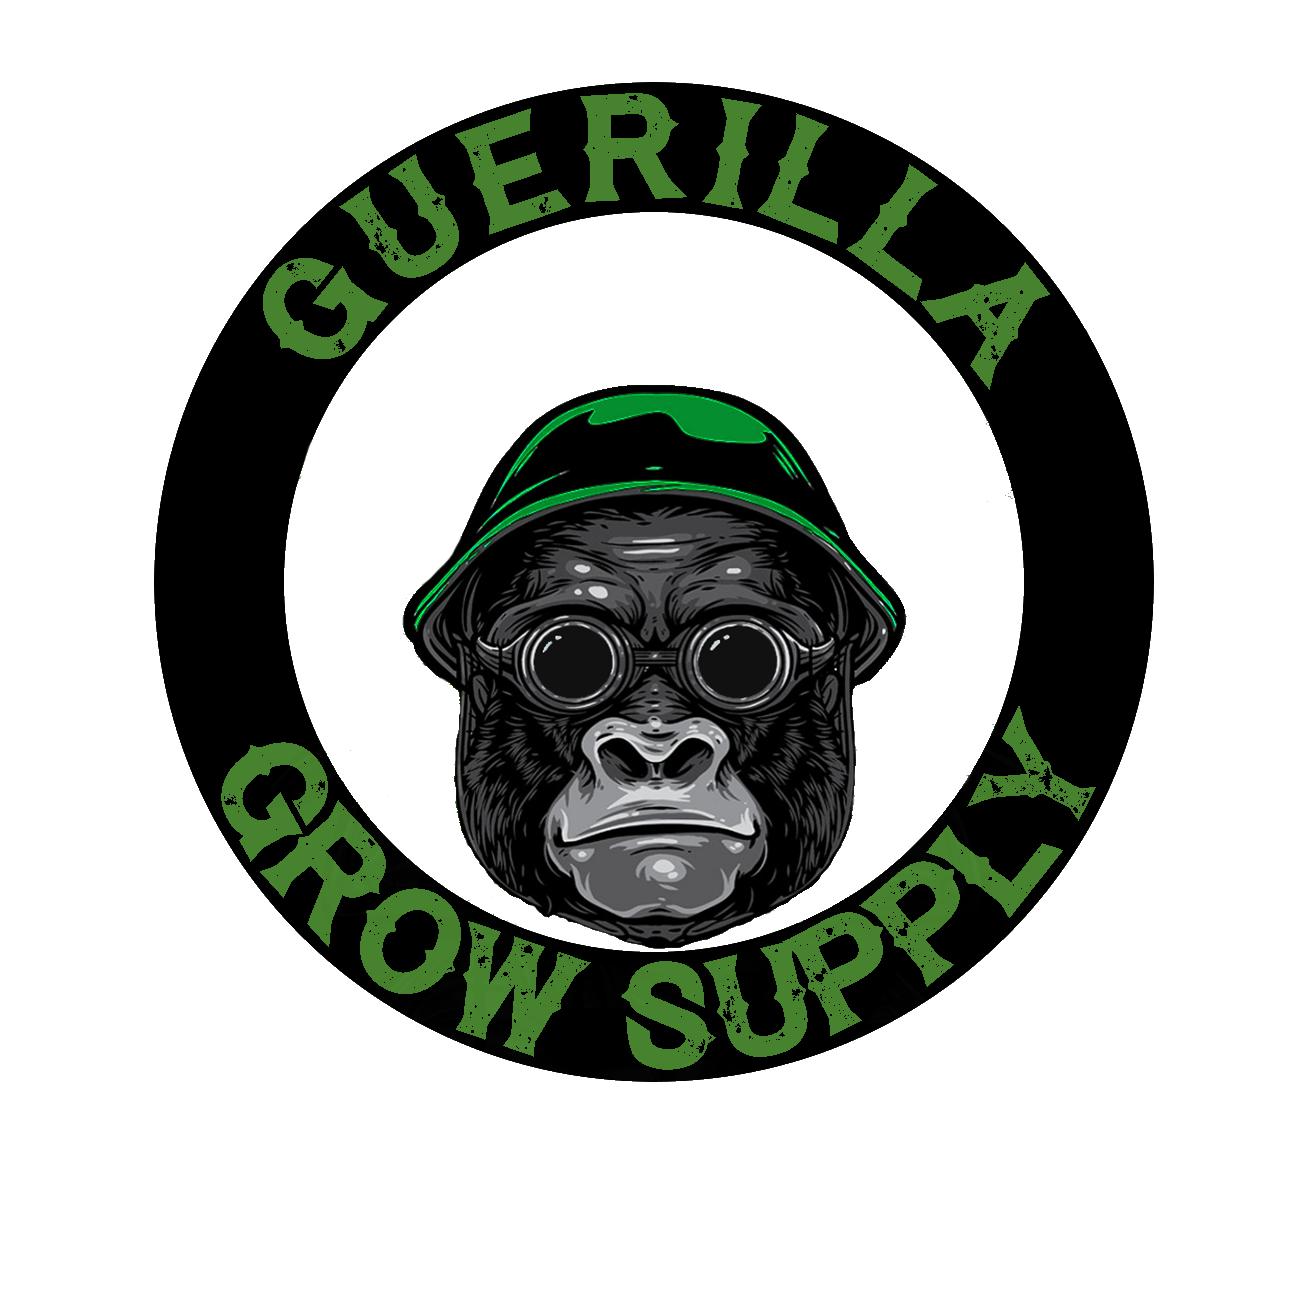 Guerrilla Grow Supply